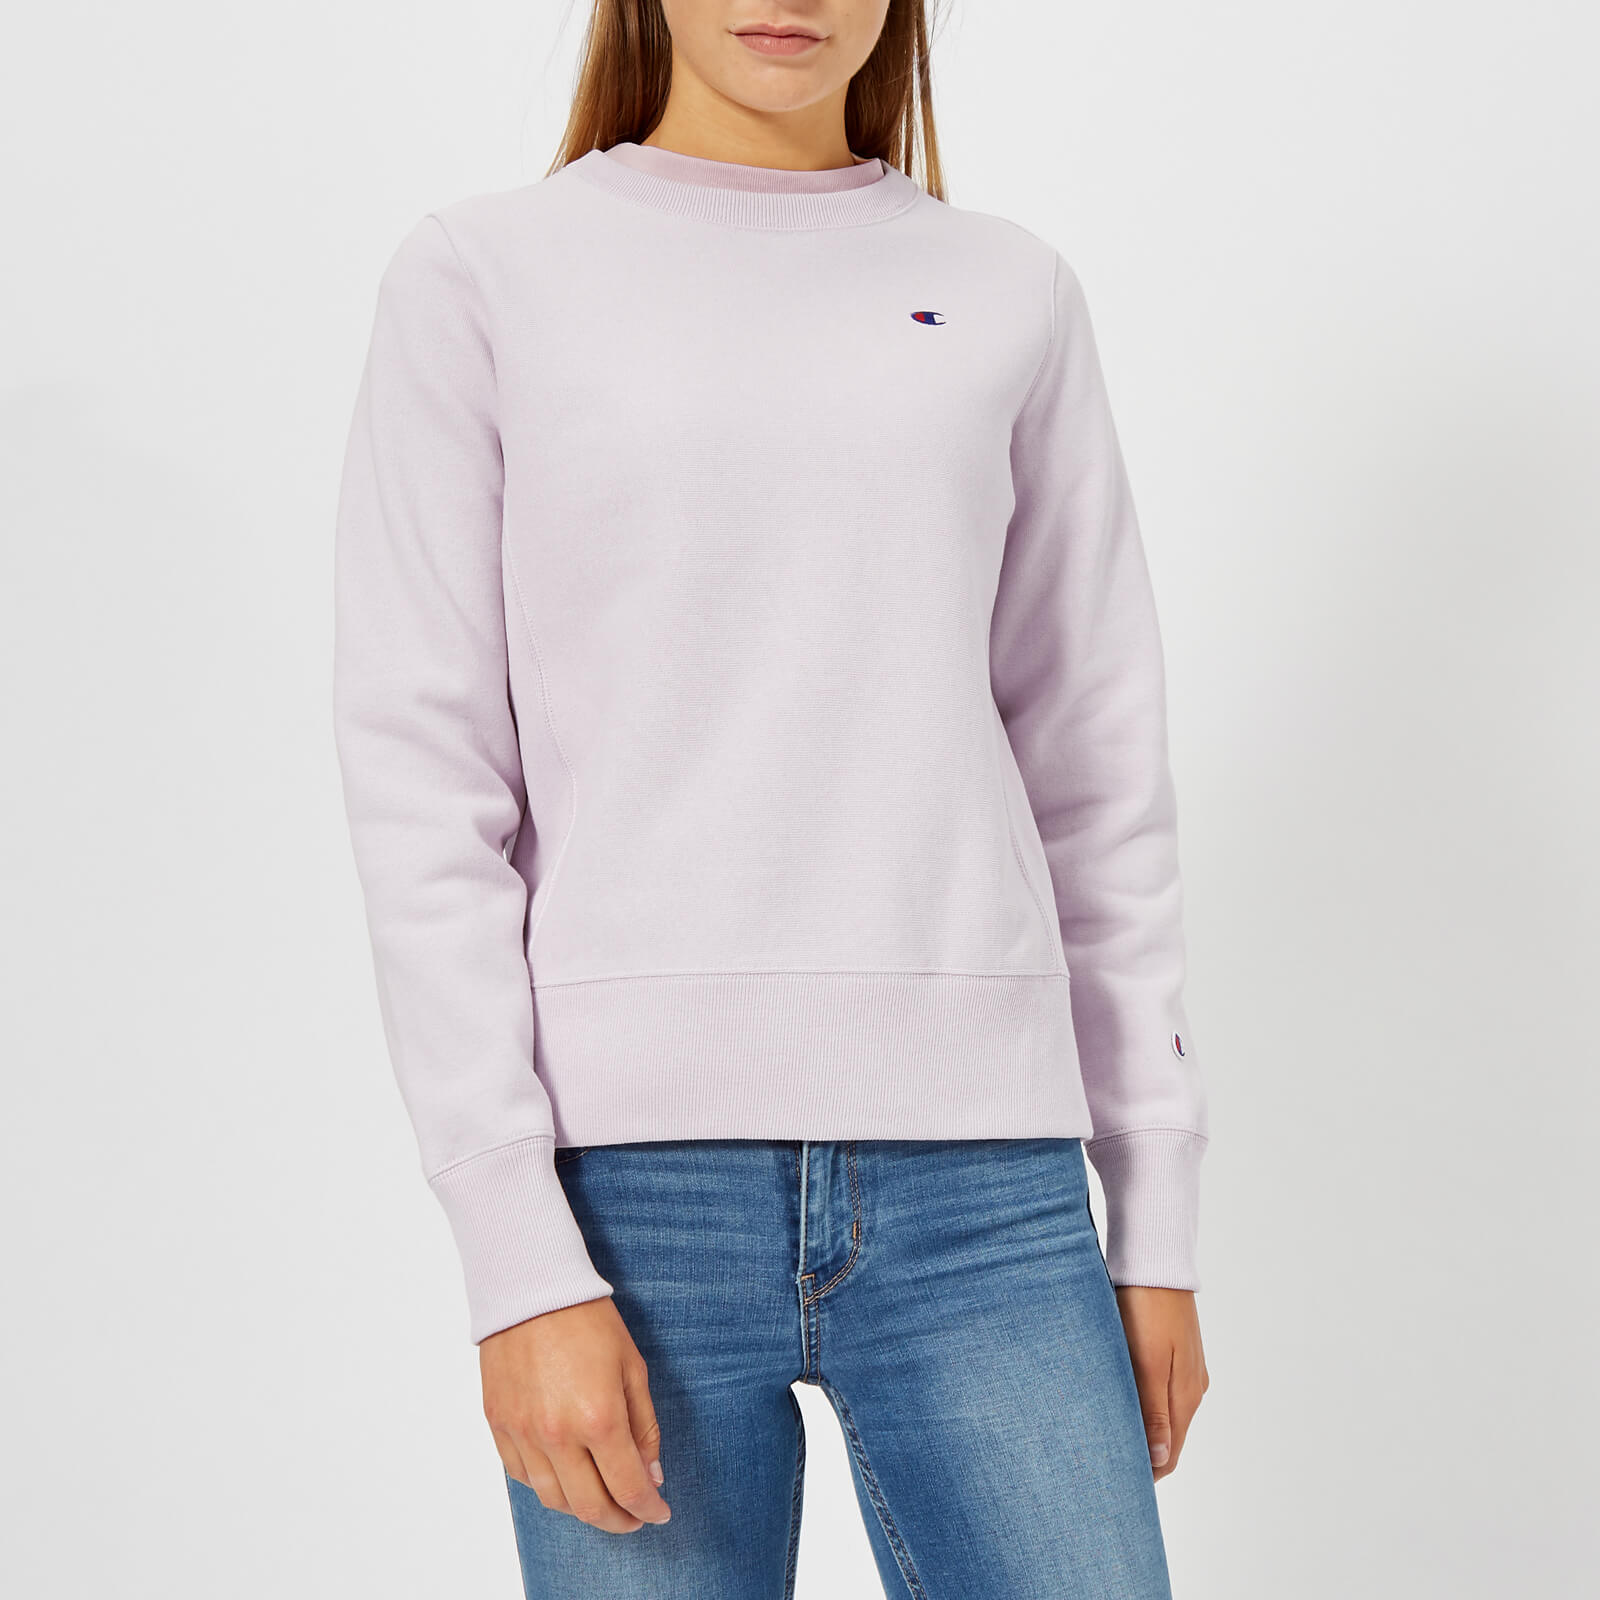 30598f719b1c Champion Women s Crew Neck Sweatshirt - Lilac Womens Clothing ...